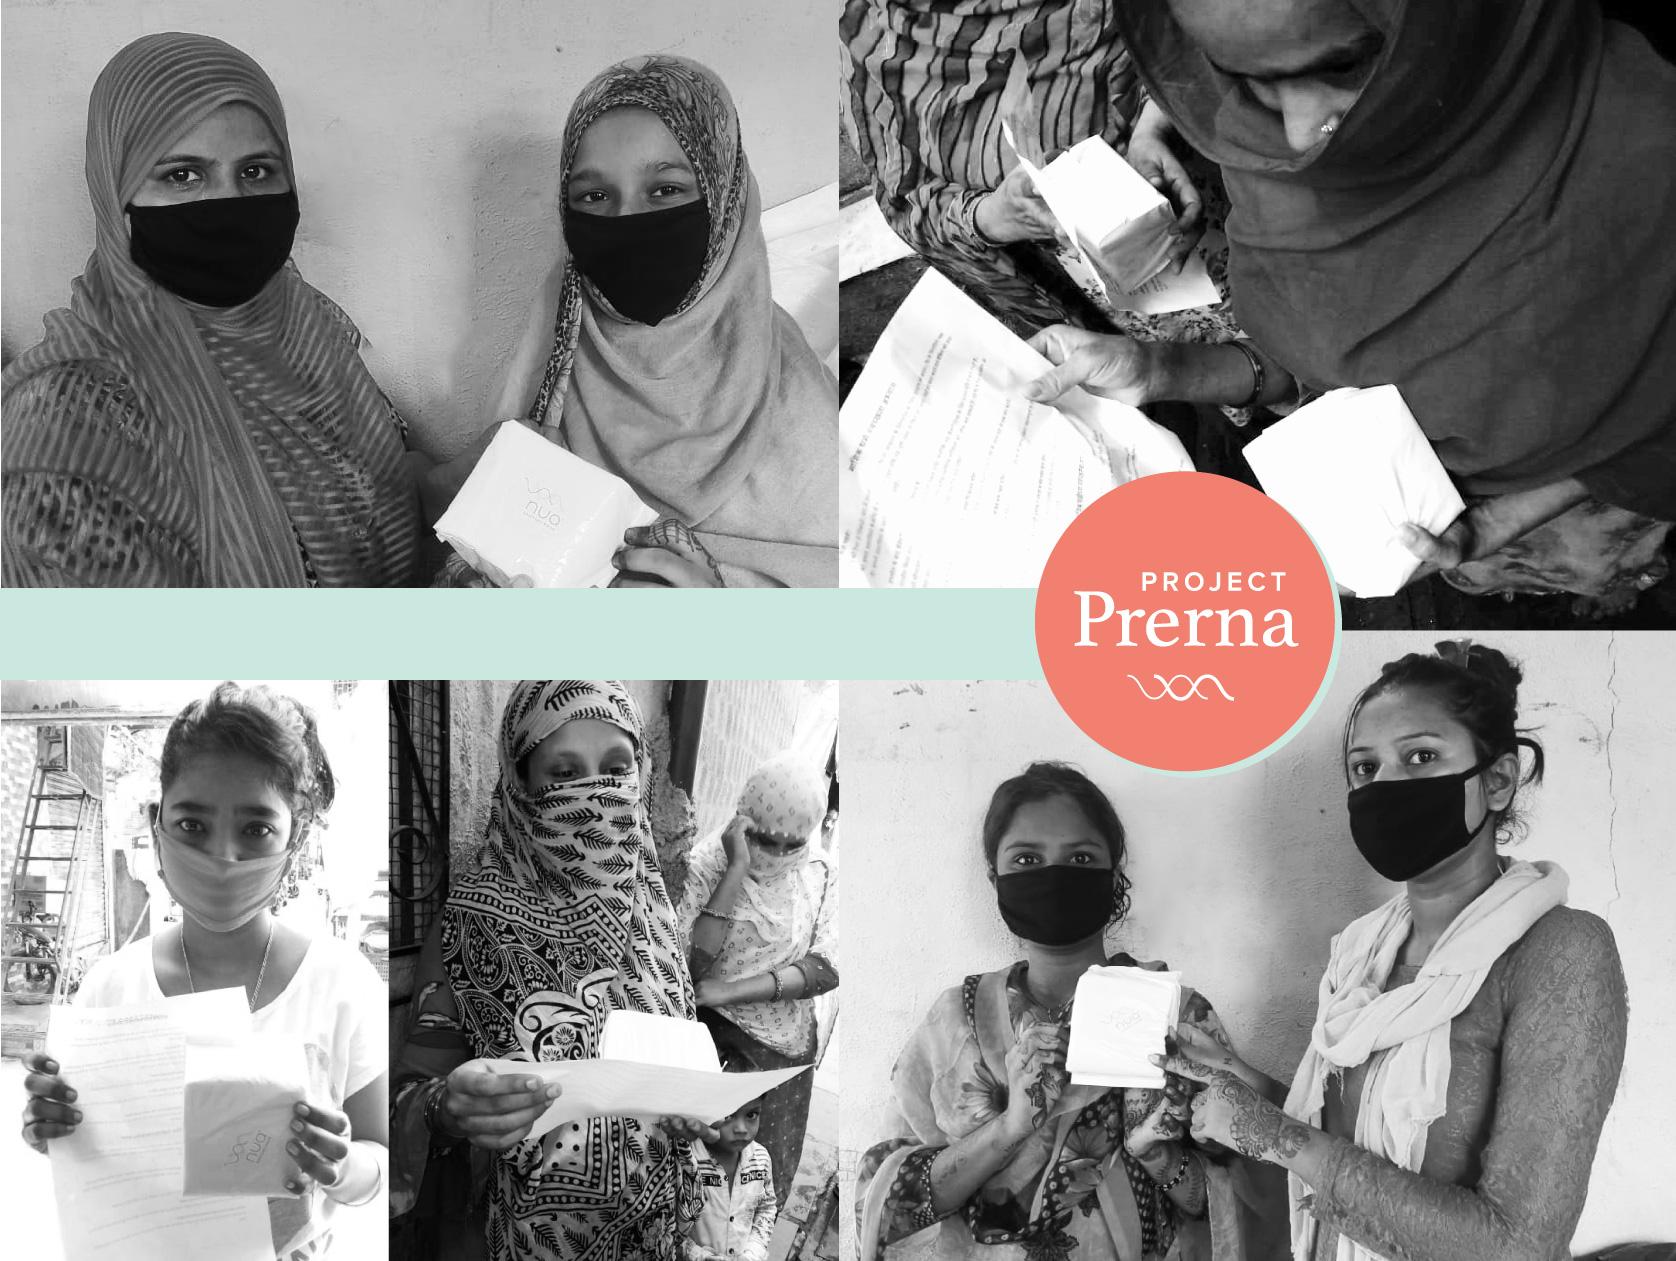 Project Prerna